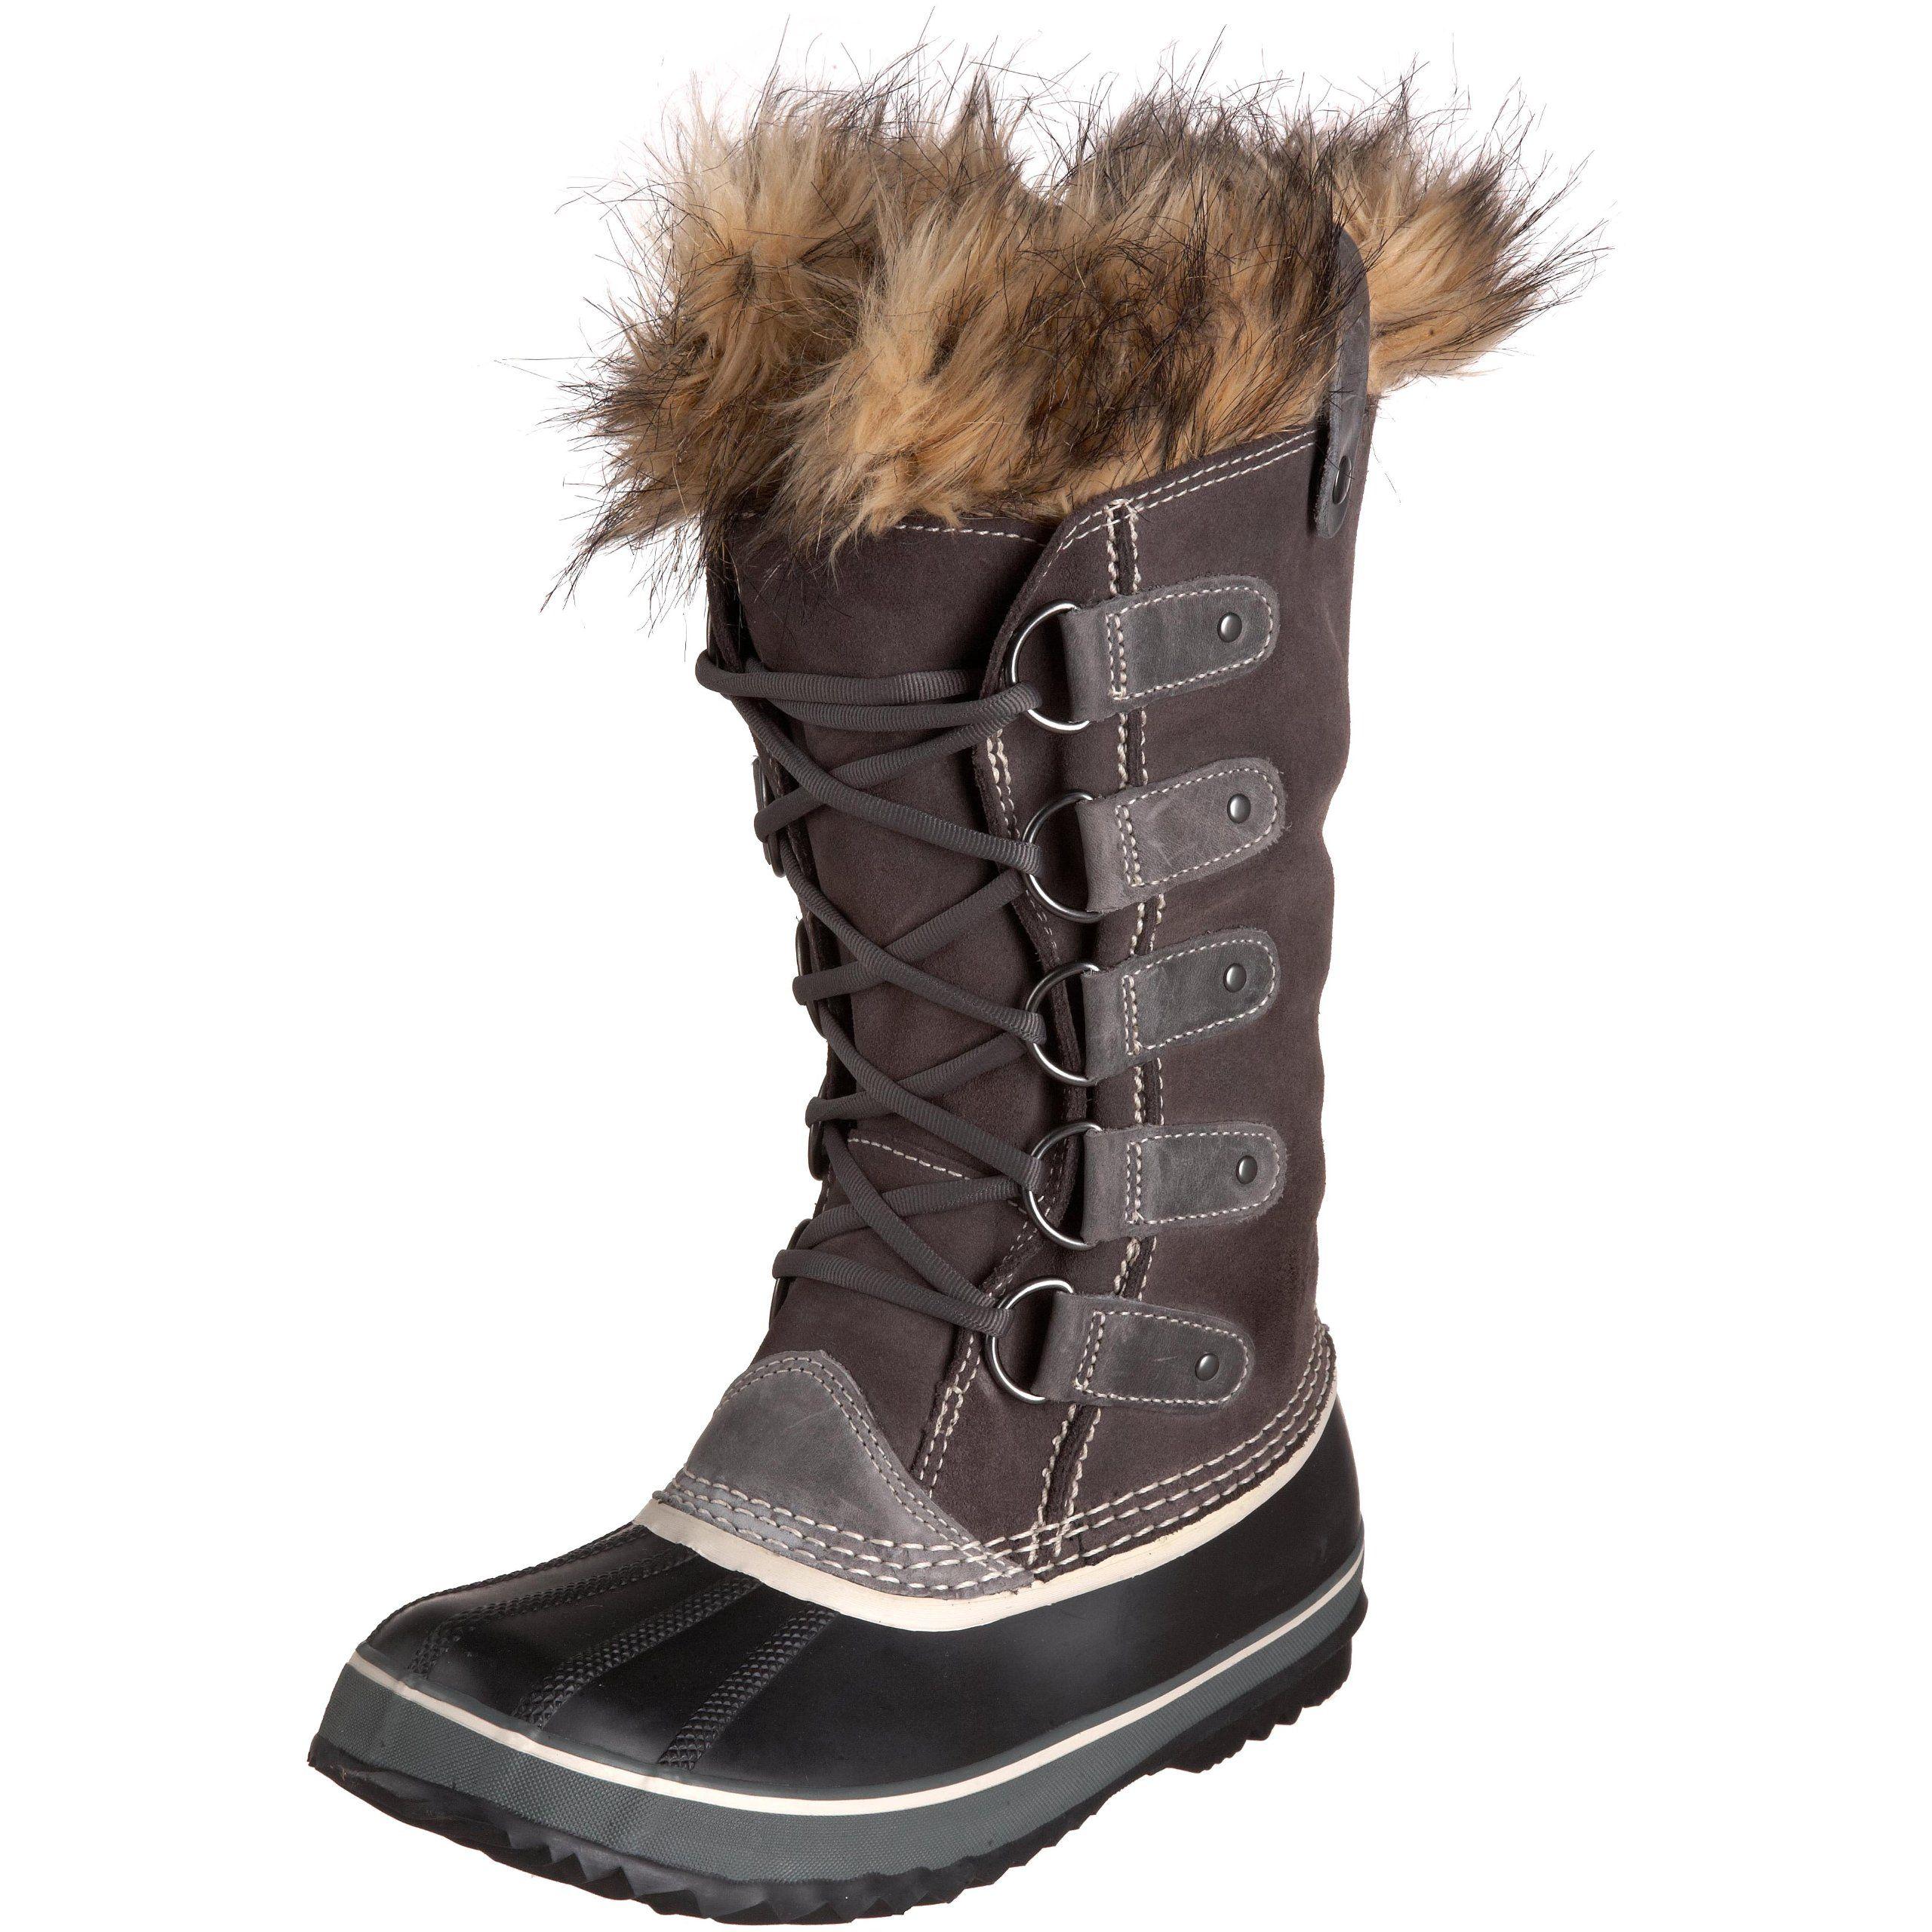 Of Boots Sorel ShaleChaussures Arctic Joan et tQrCsdhx